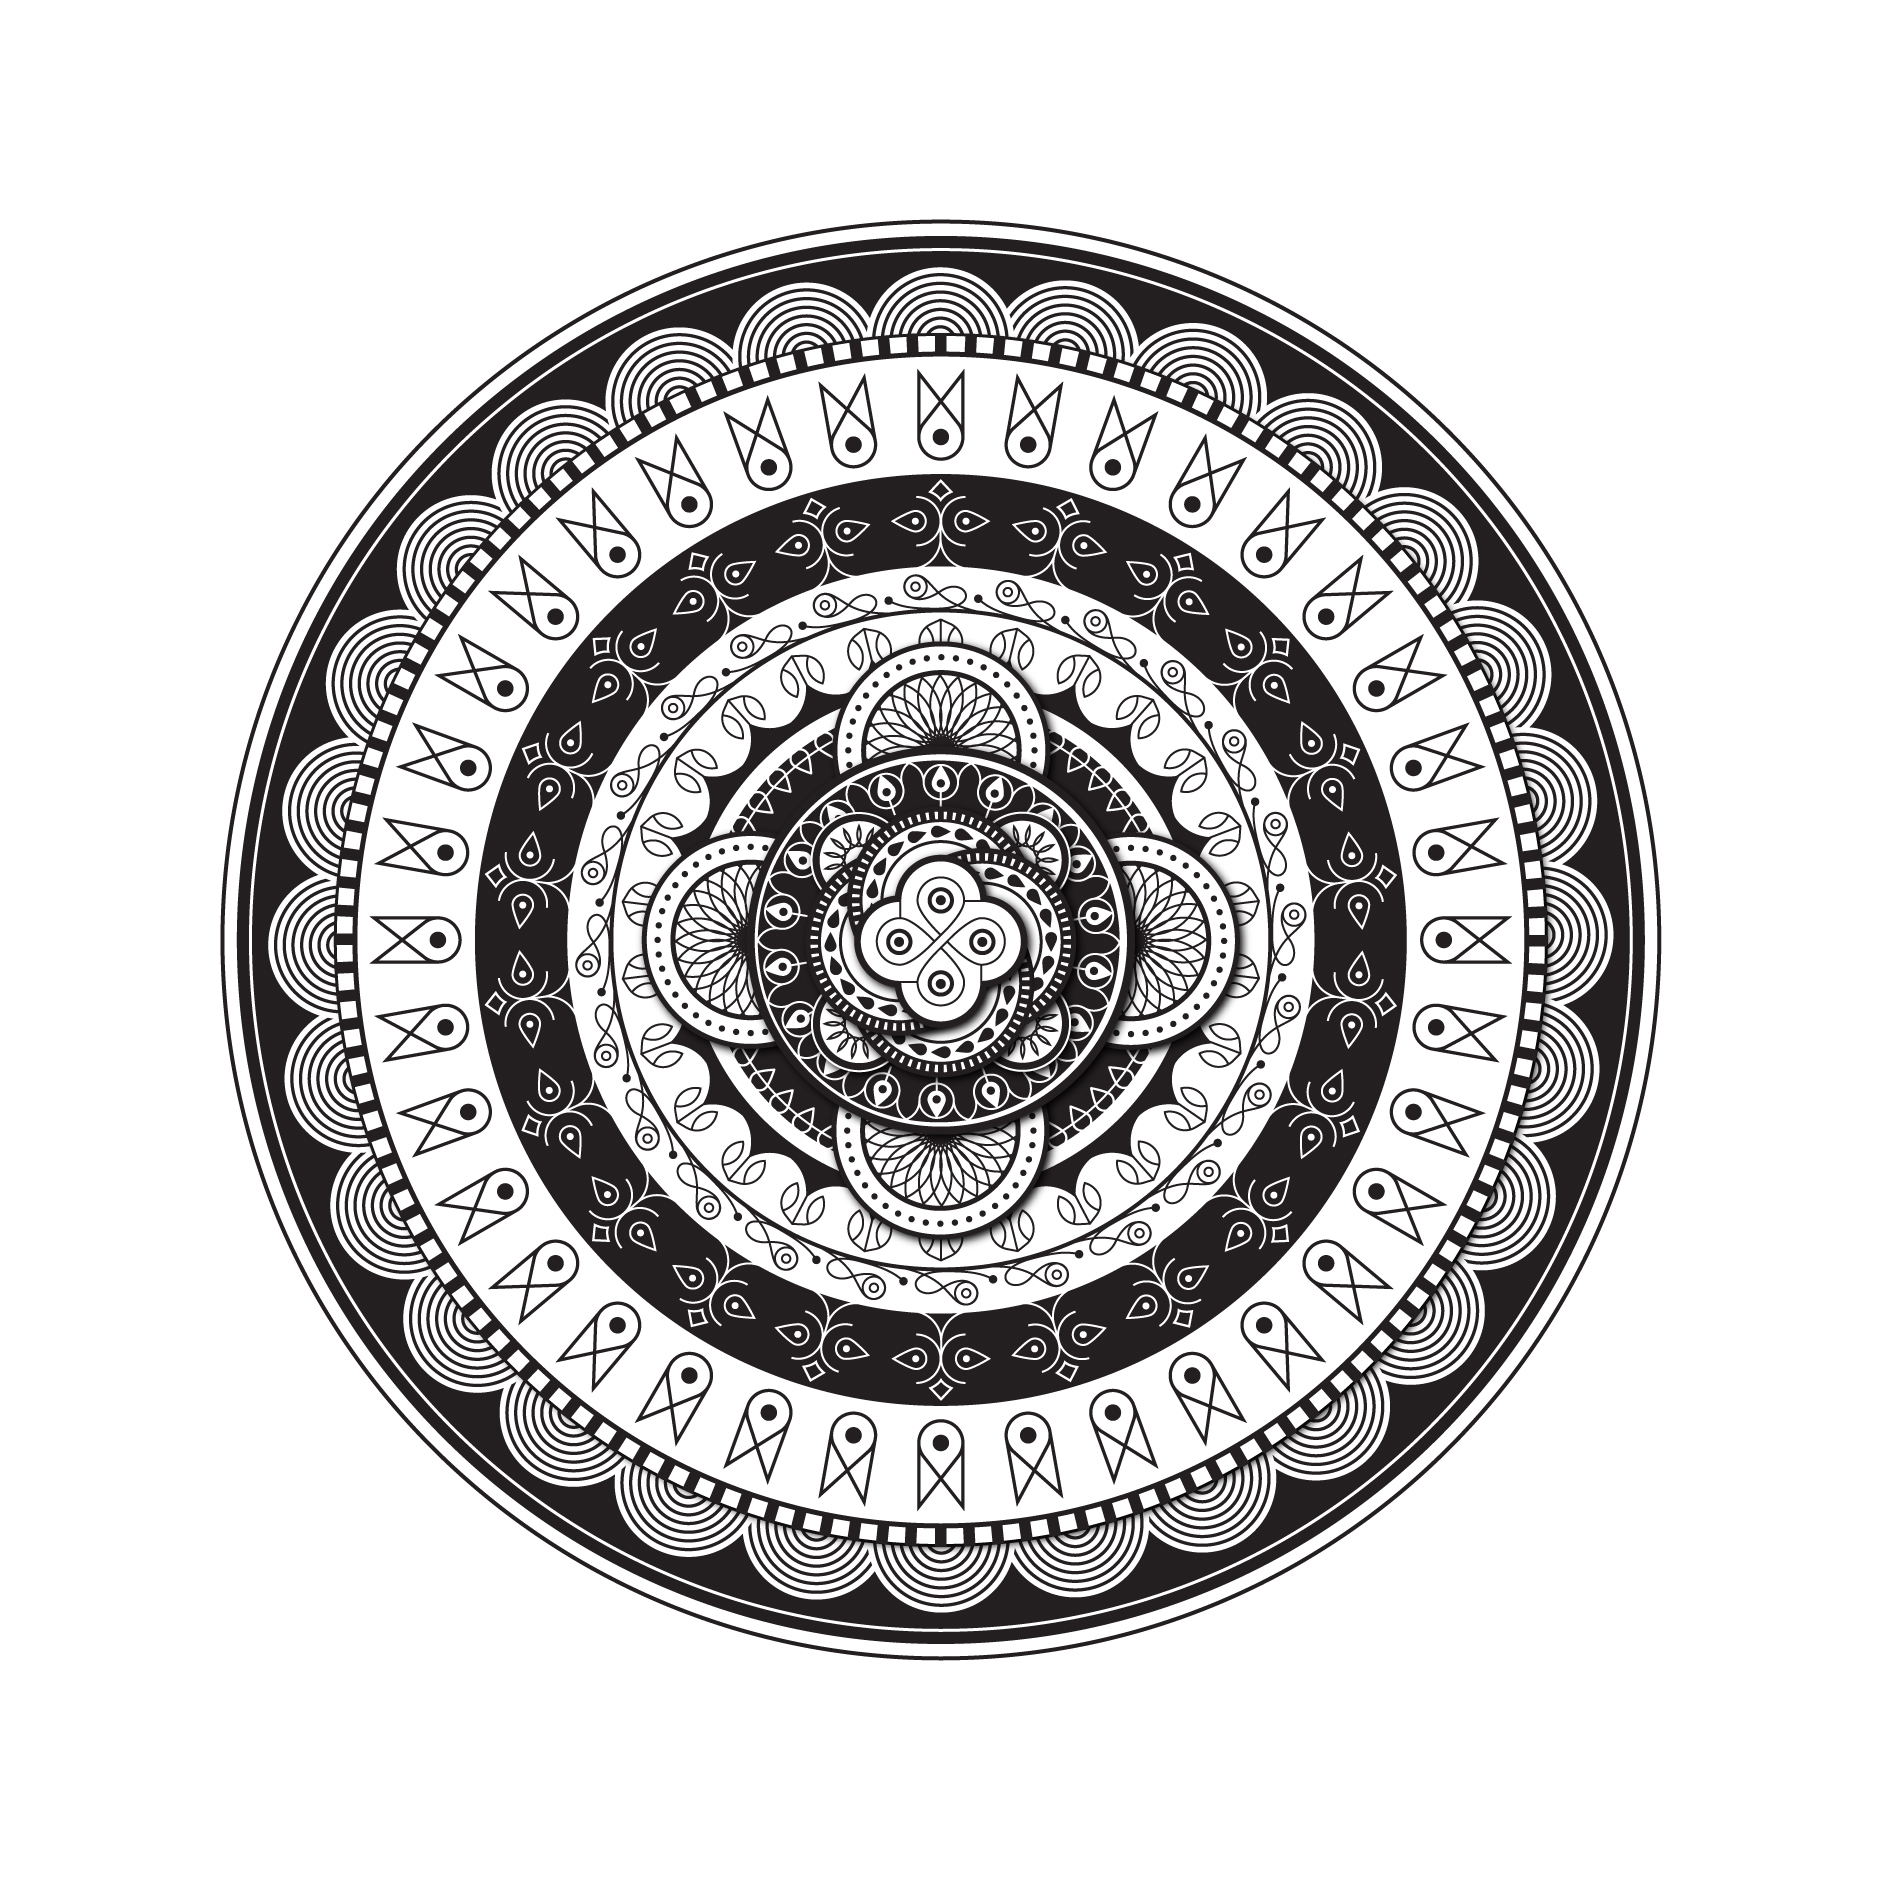 plate_pattern01.jpg